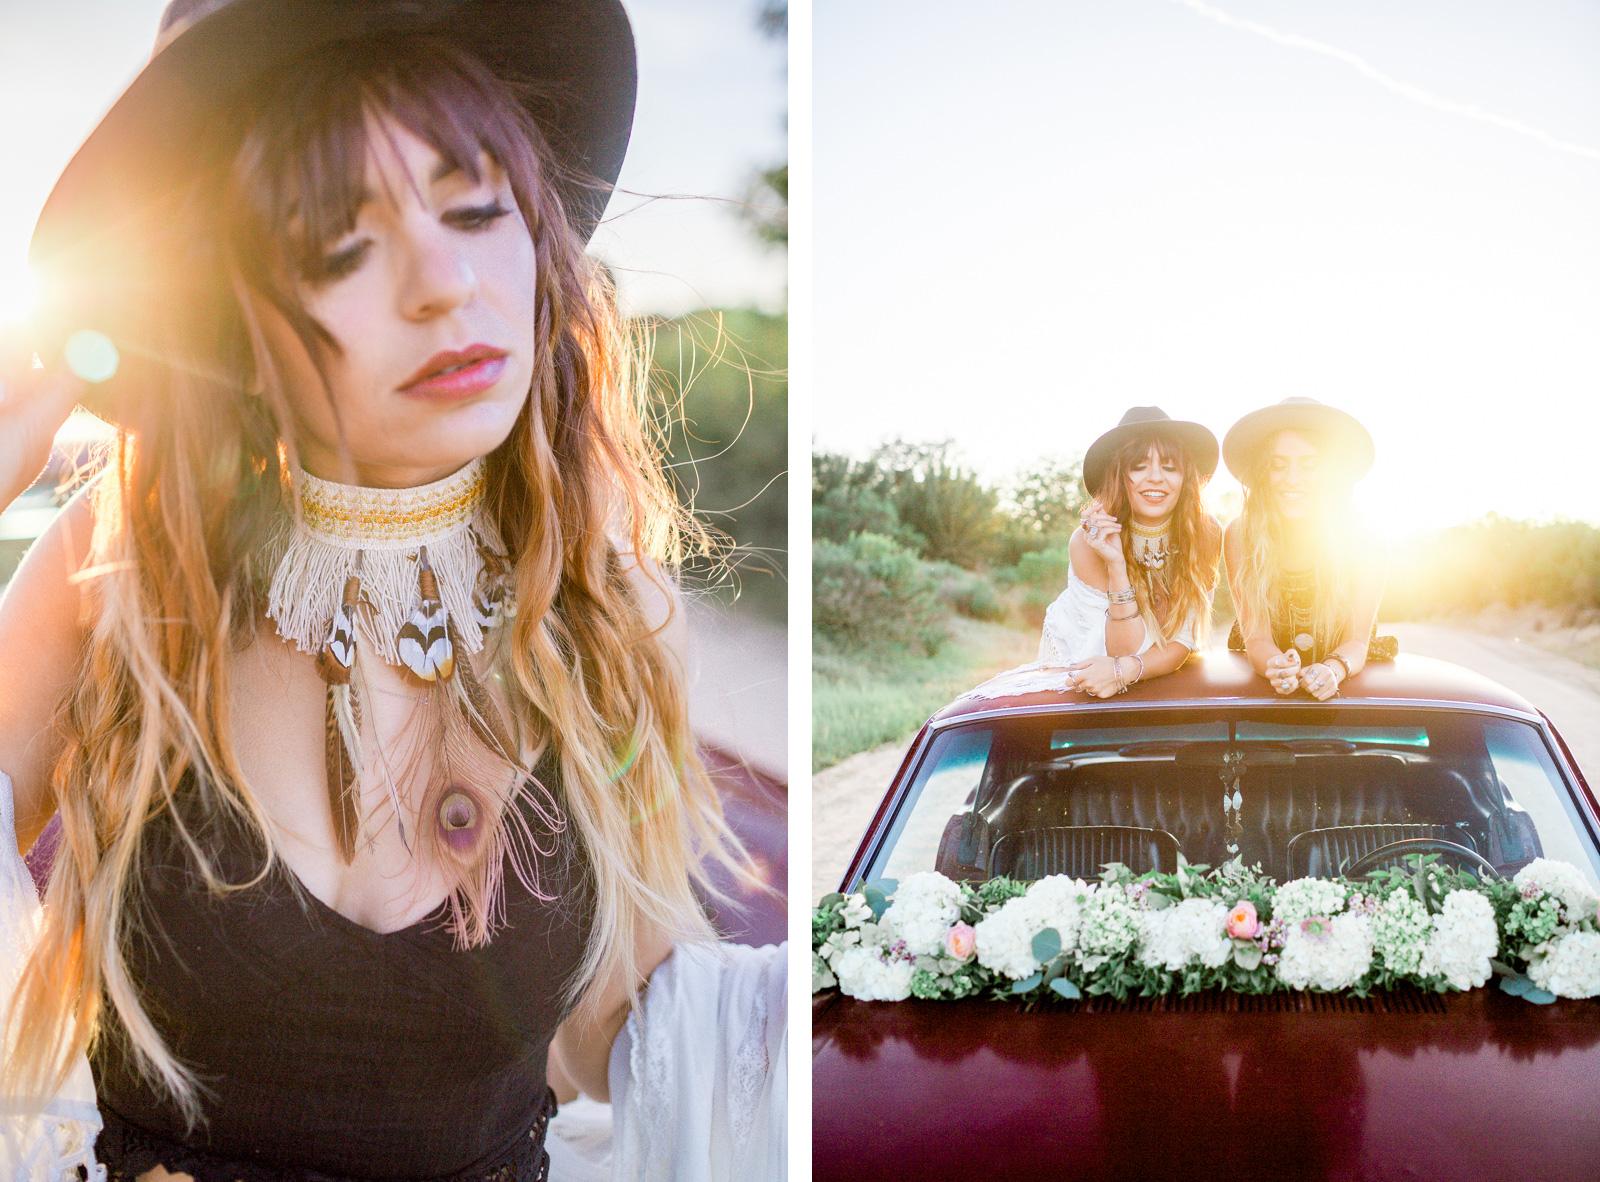 Festival-Stagecoach-Inspiration-Velvet-Sugar-Decorated-Mustang_02.jpg